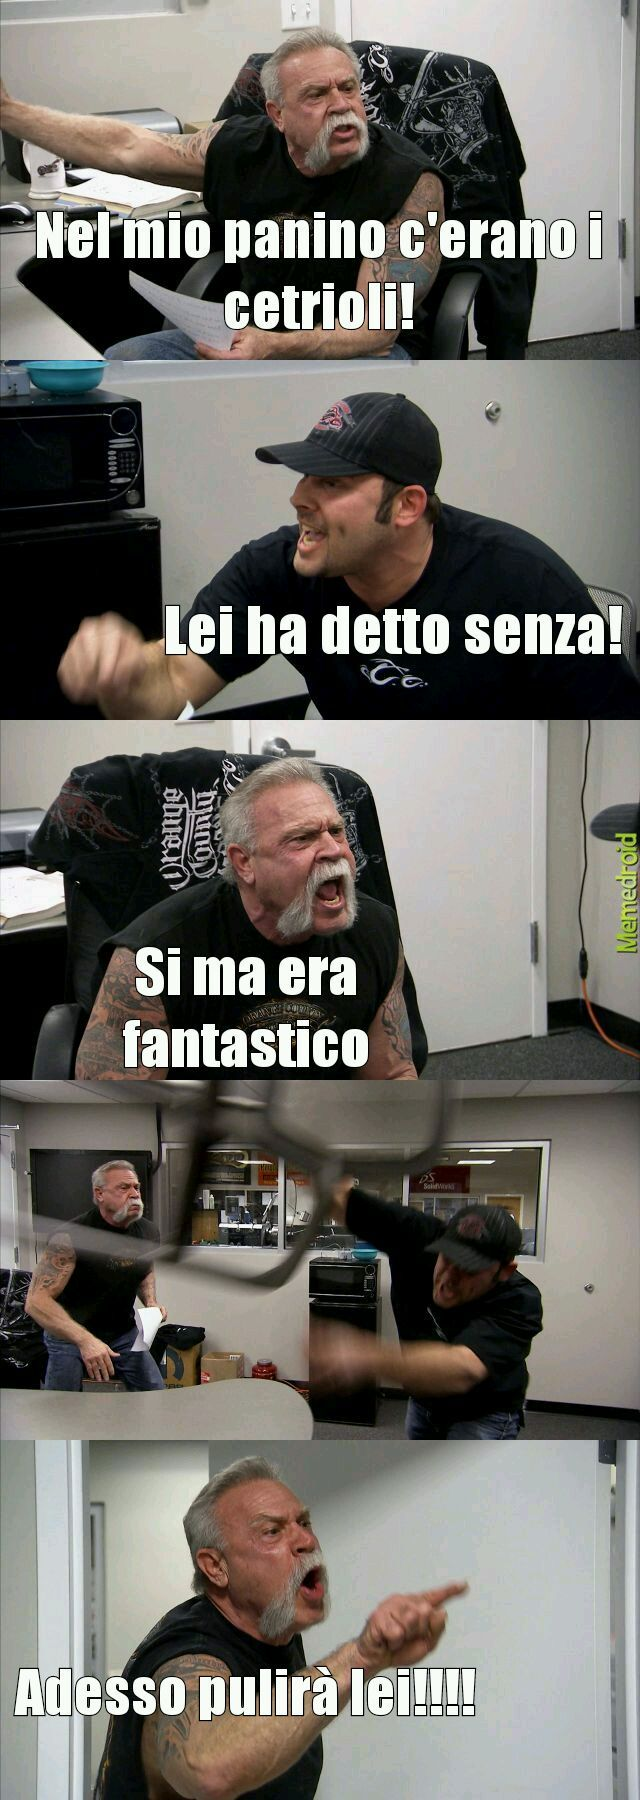 Cetrioli - meme